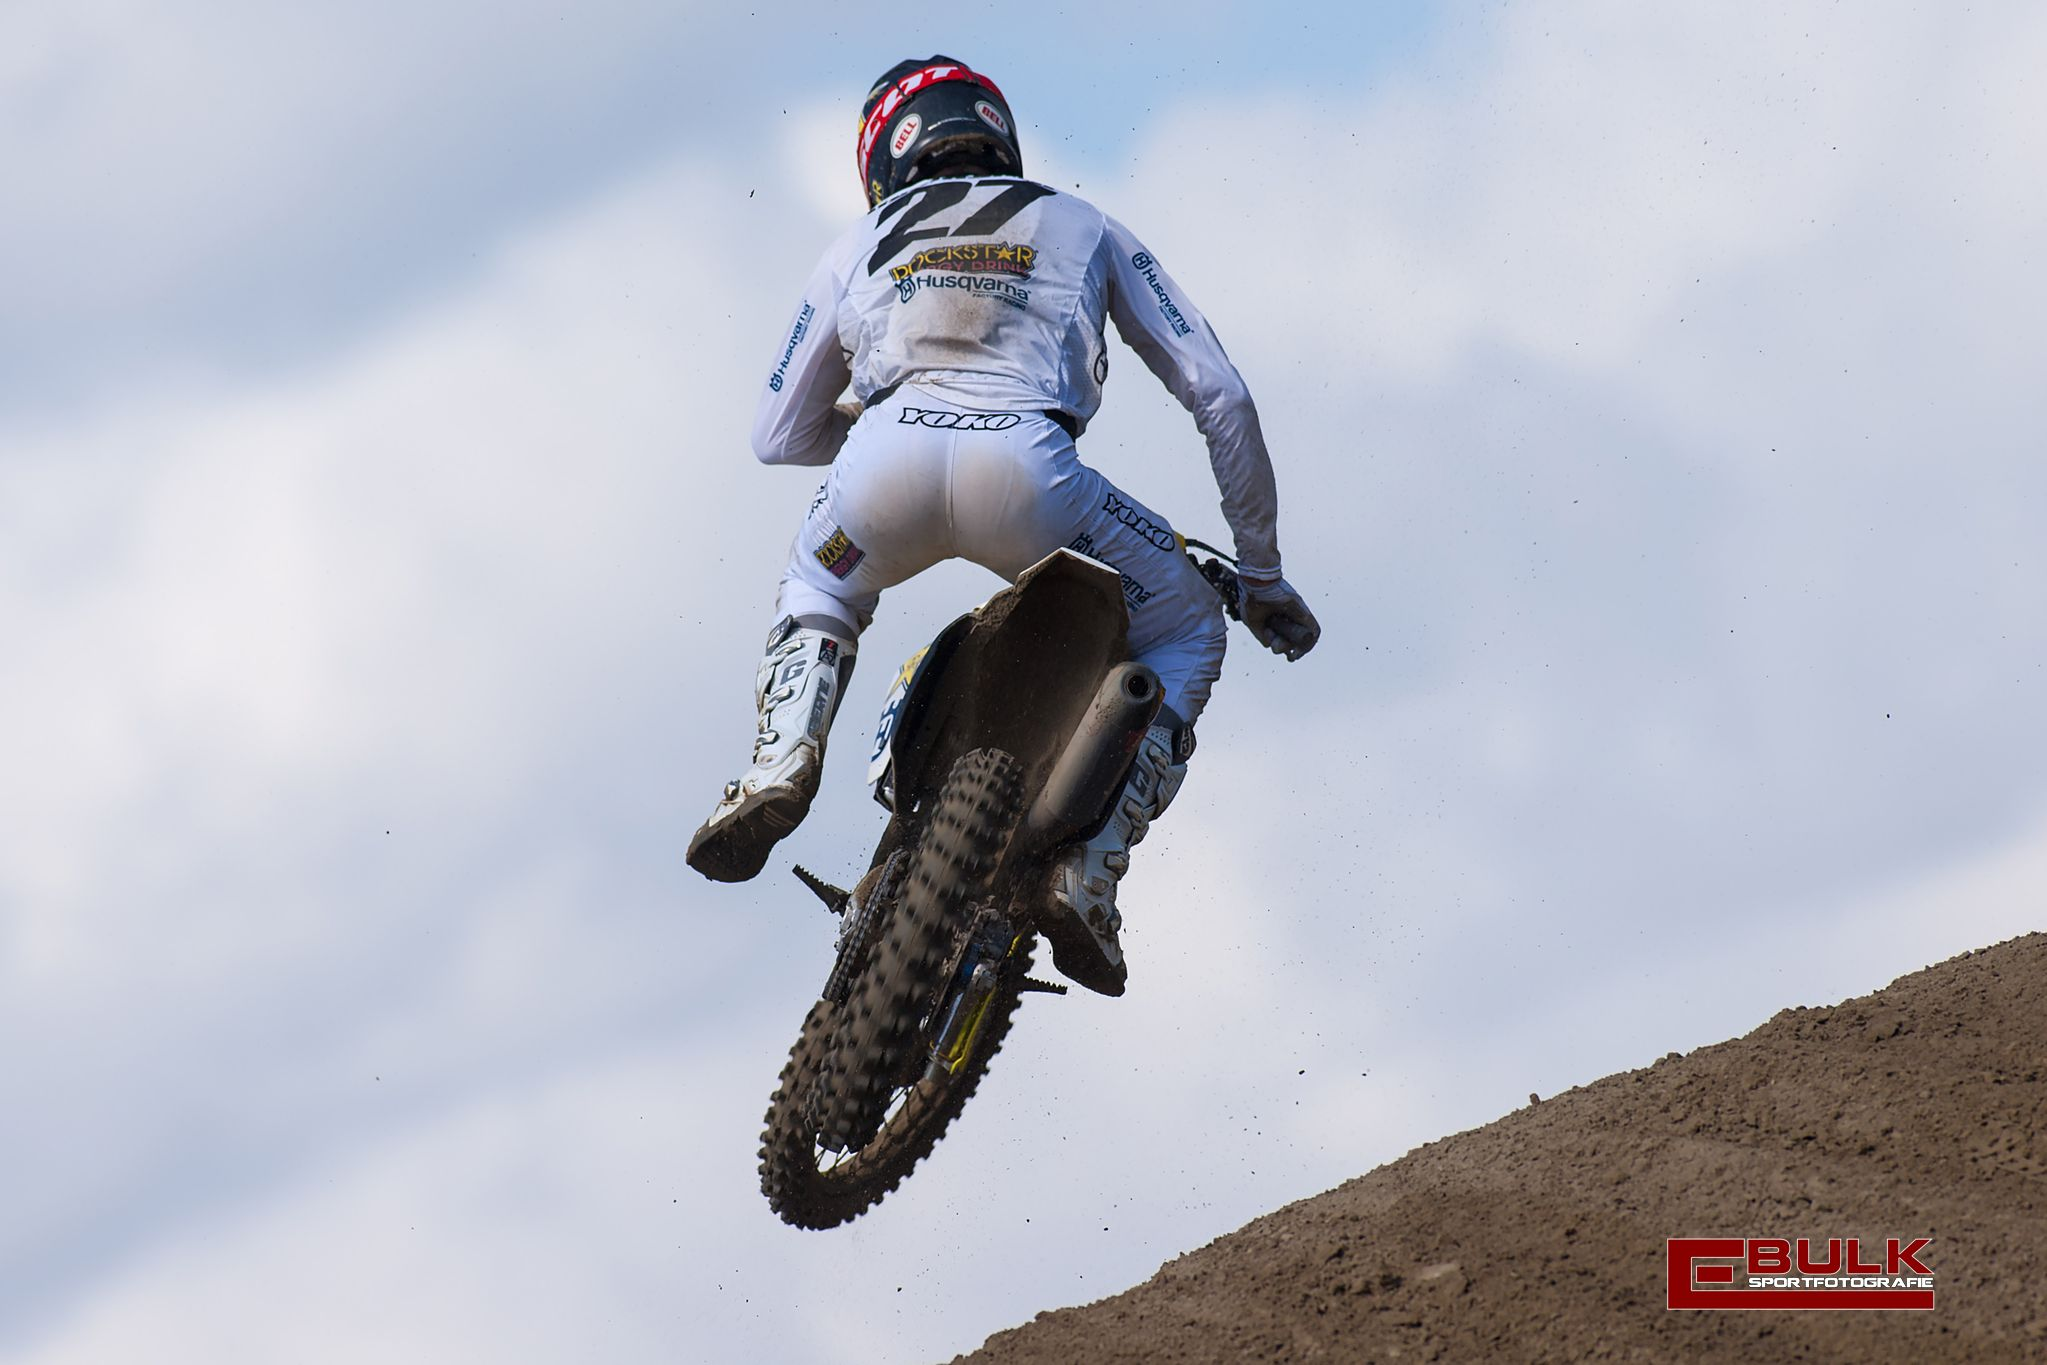 ebs_0770-ed_bulk_sportfotografie